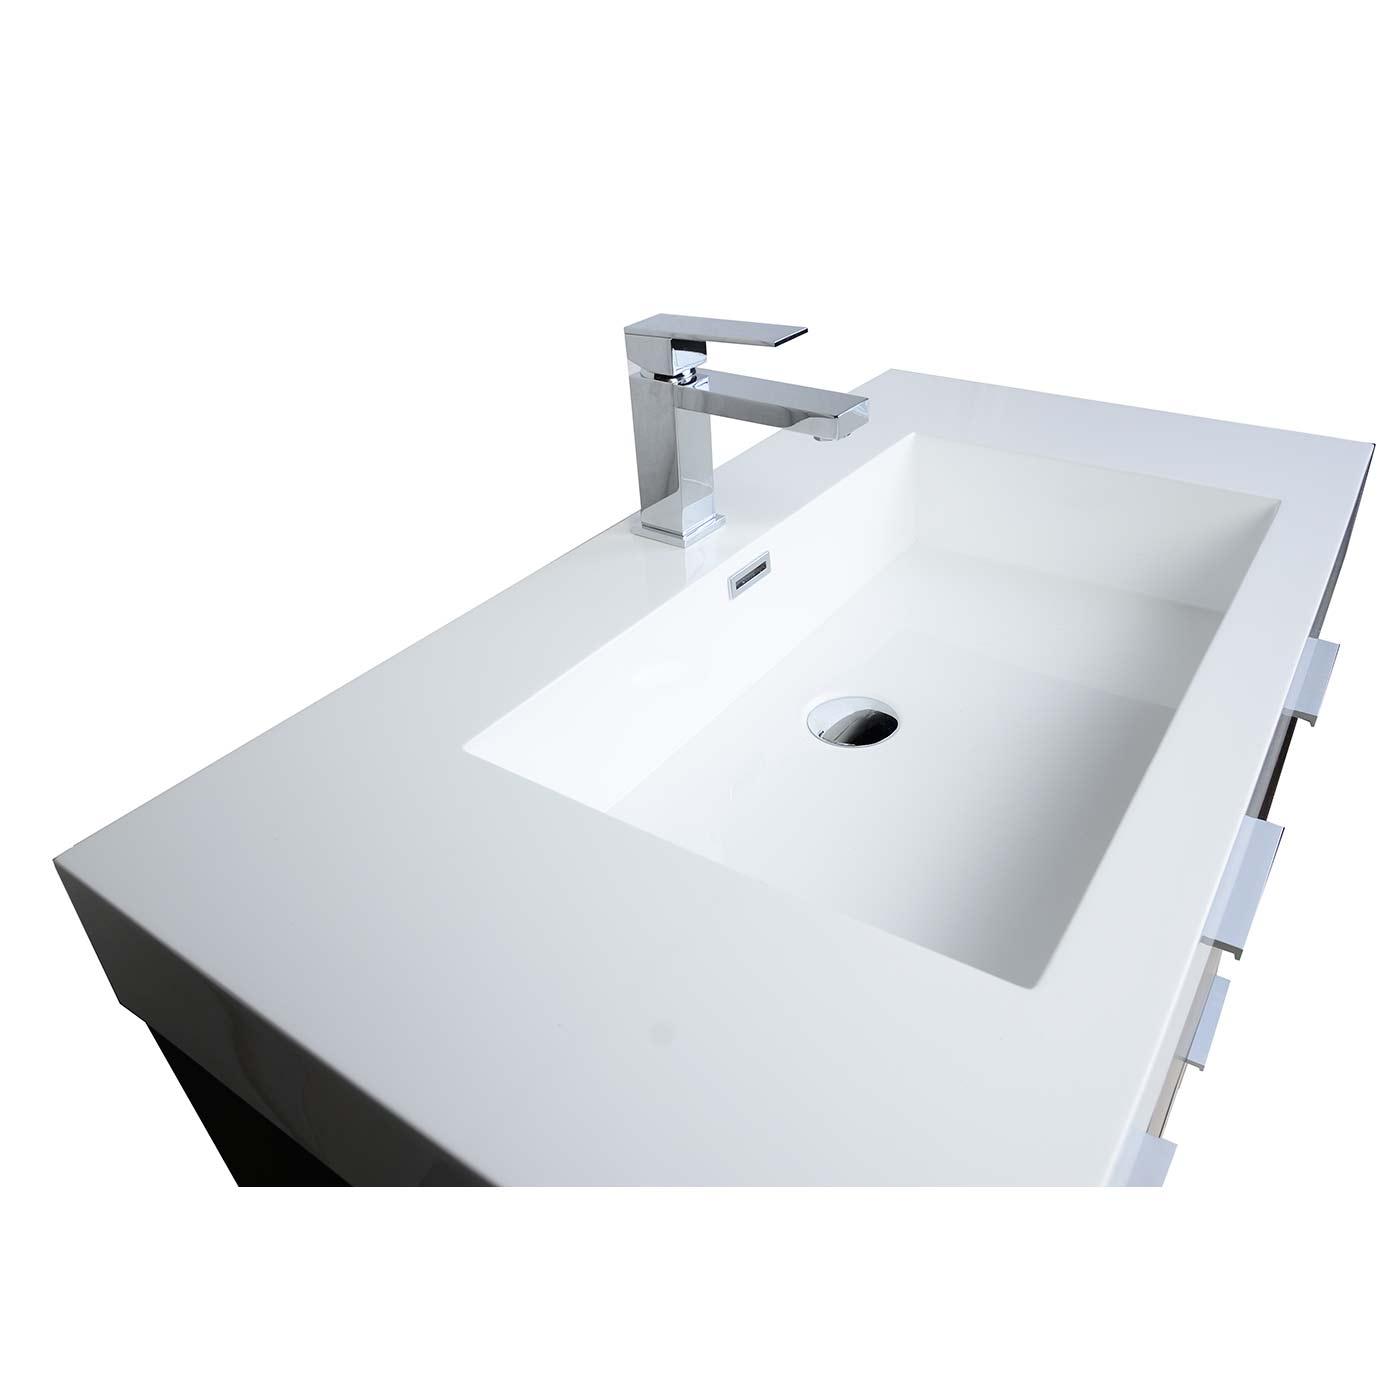 Do Vanity Lights Go Up Or Down : 900 Bathroom Vanity Ideas Comeonlight Bathroom Vanity Light With Crystal Cube Led Wall,Buy 35 ...